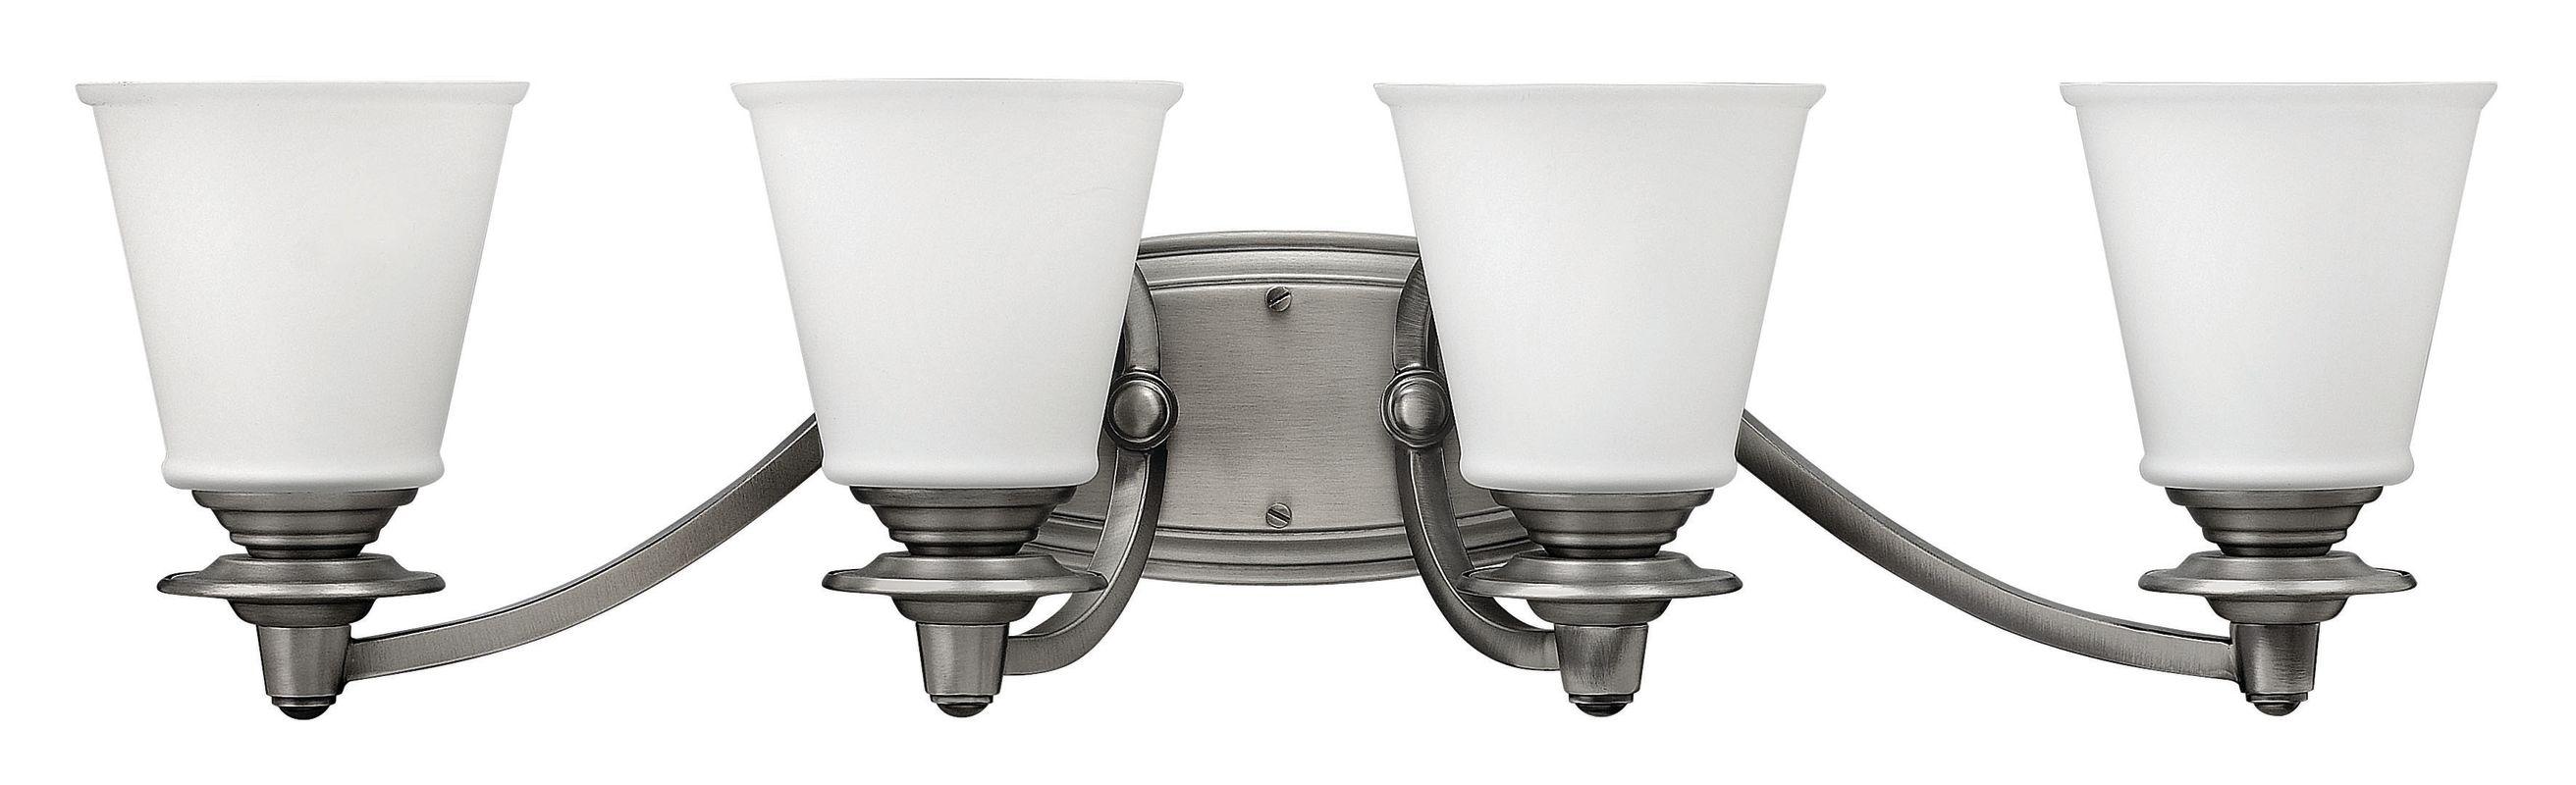 Hinkley Lighting 54264 4 Light Bathroom Vanity Light from the Plymouth